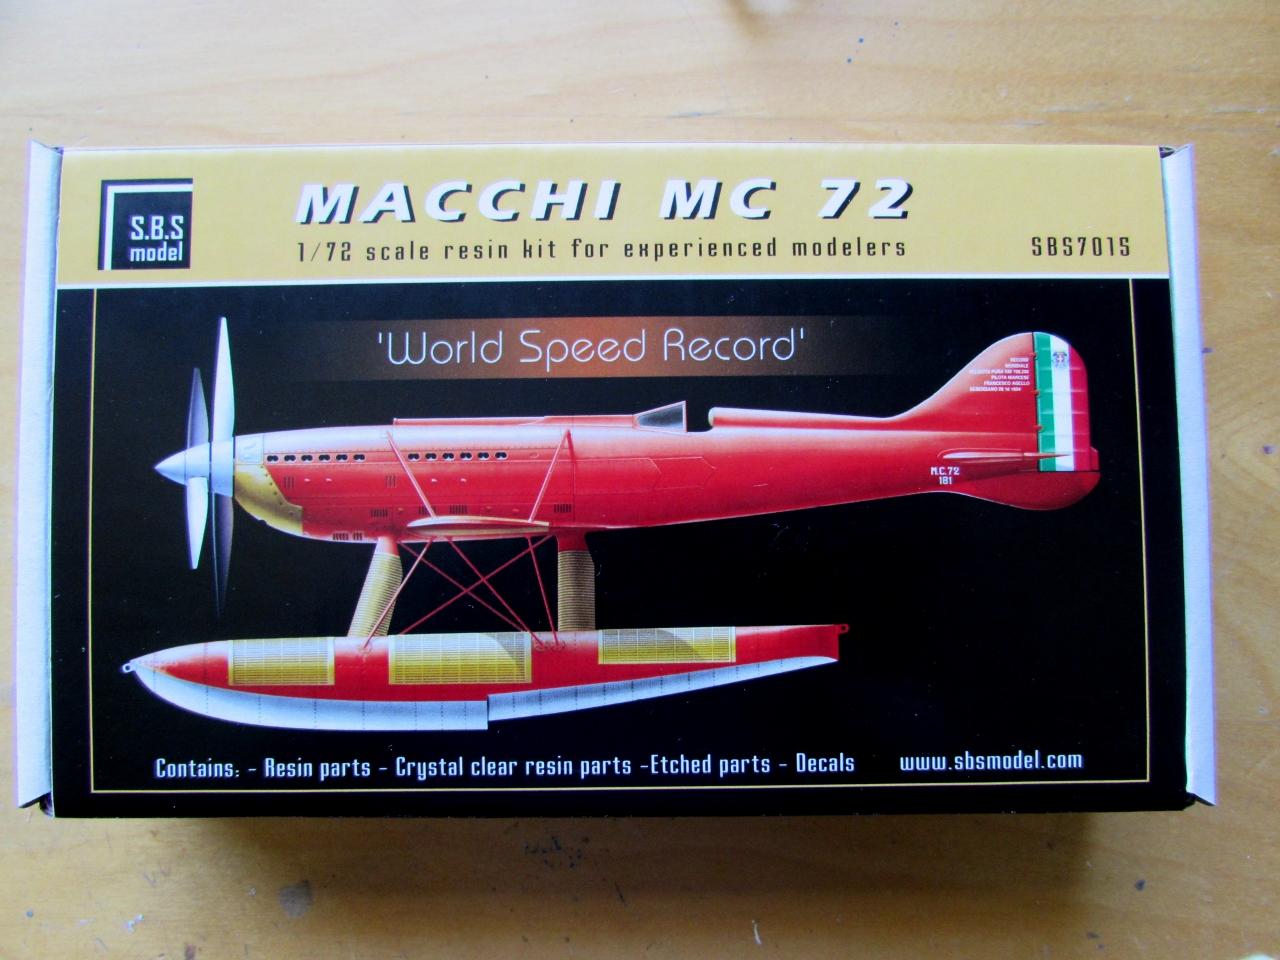 Macchi MC 72 Bracing Wire Set S.B.S Modèles SBS-72042 1:72